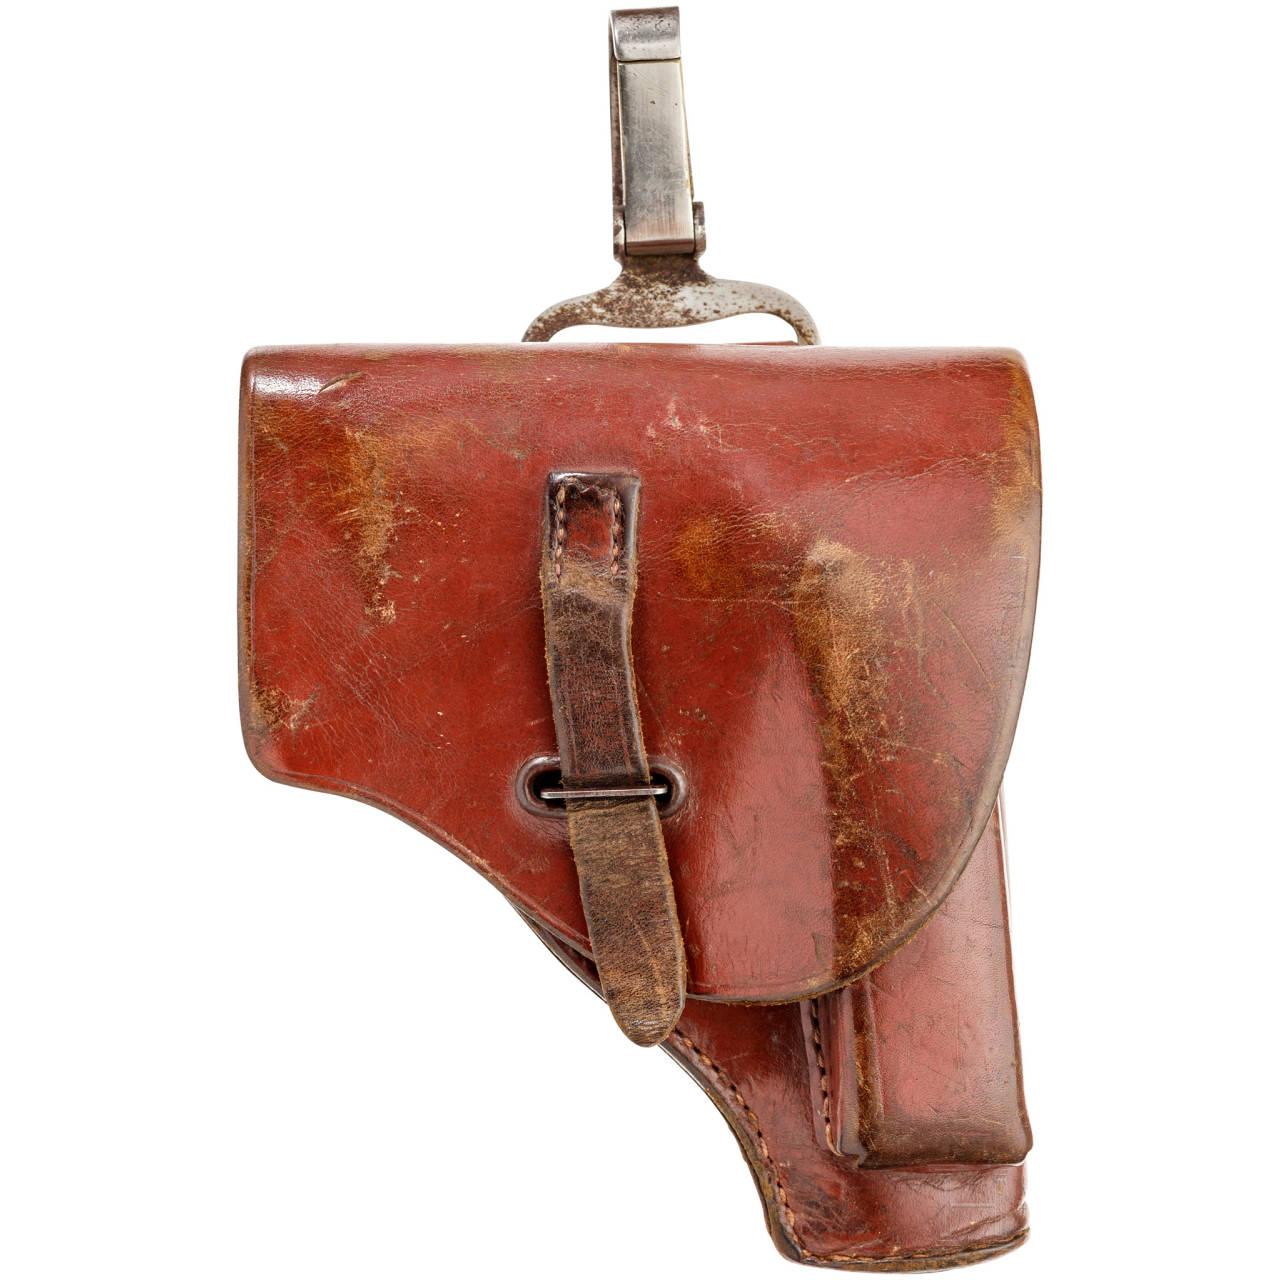 Tasche zur Beretta Mod. 1934/35